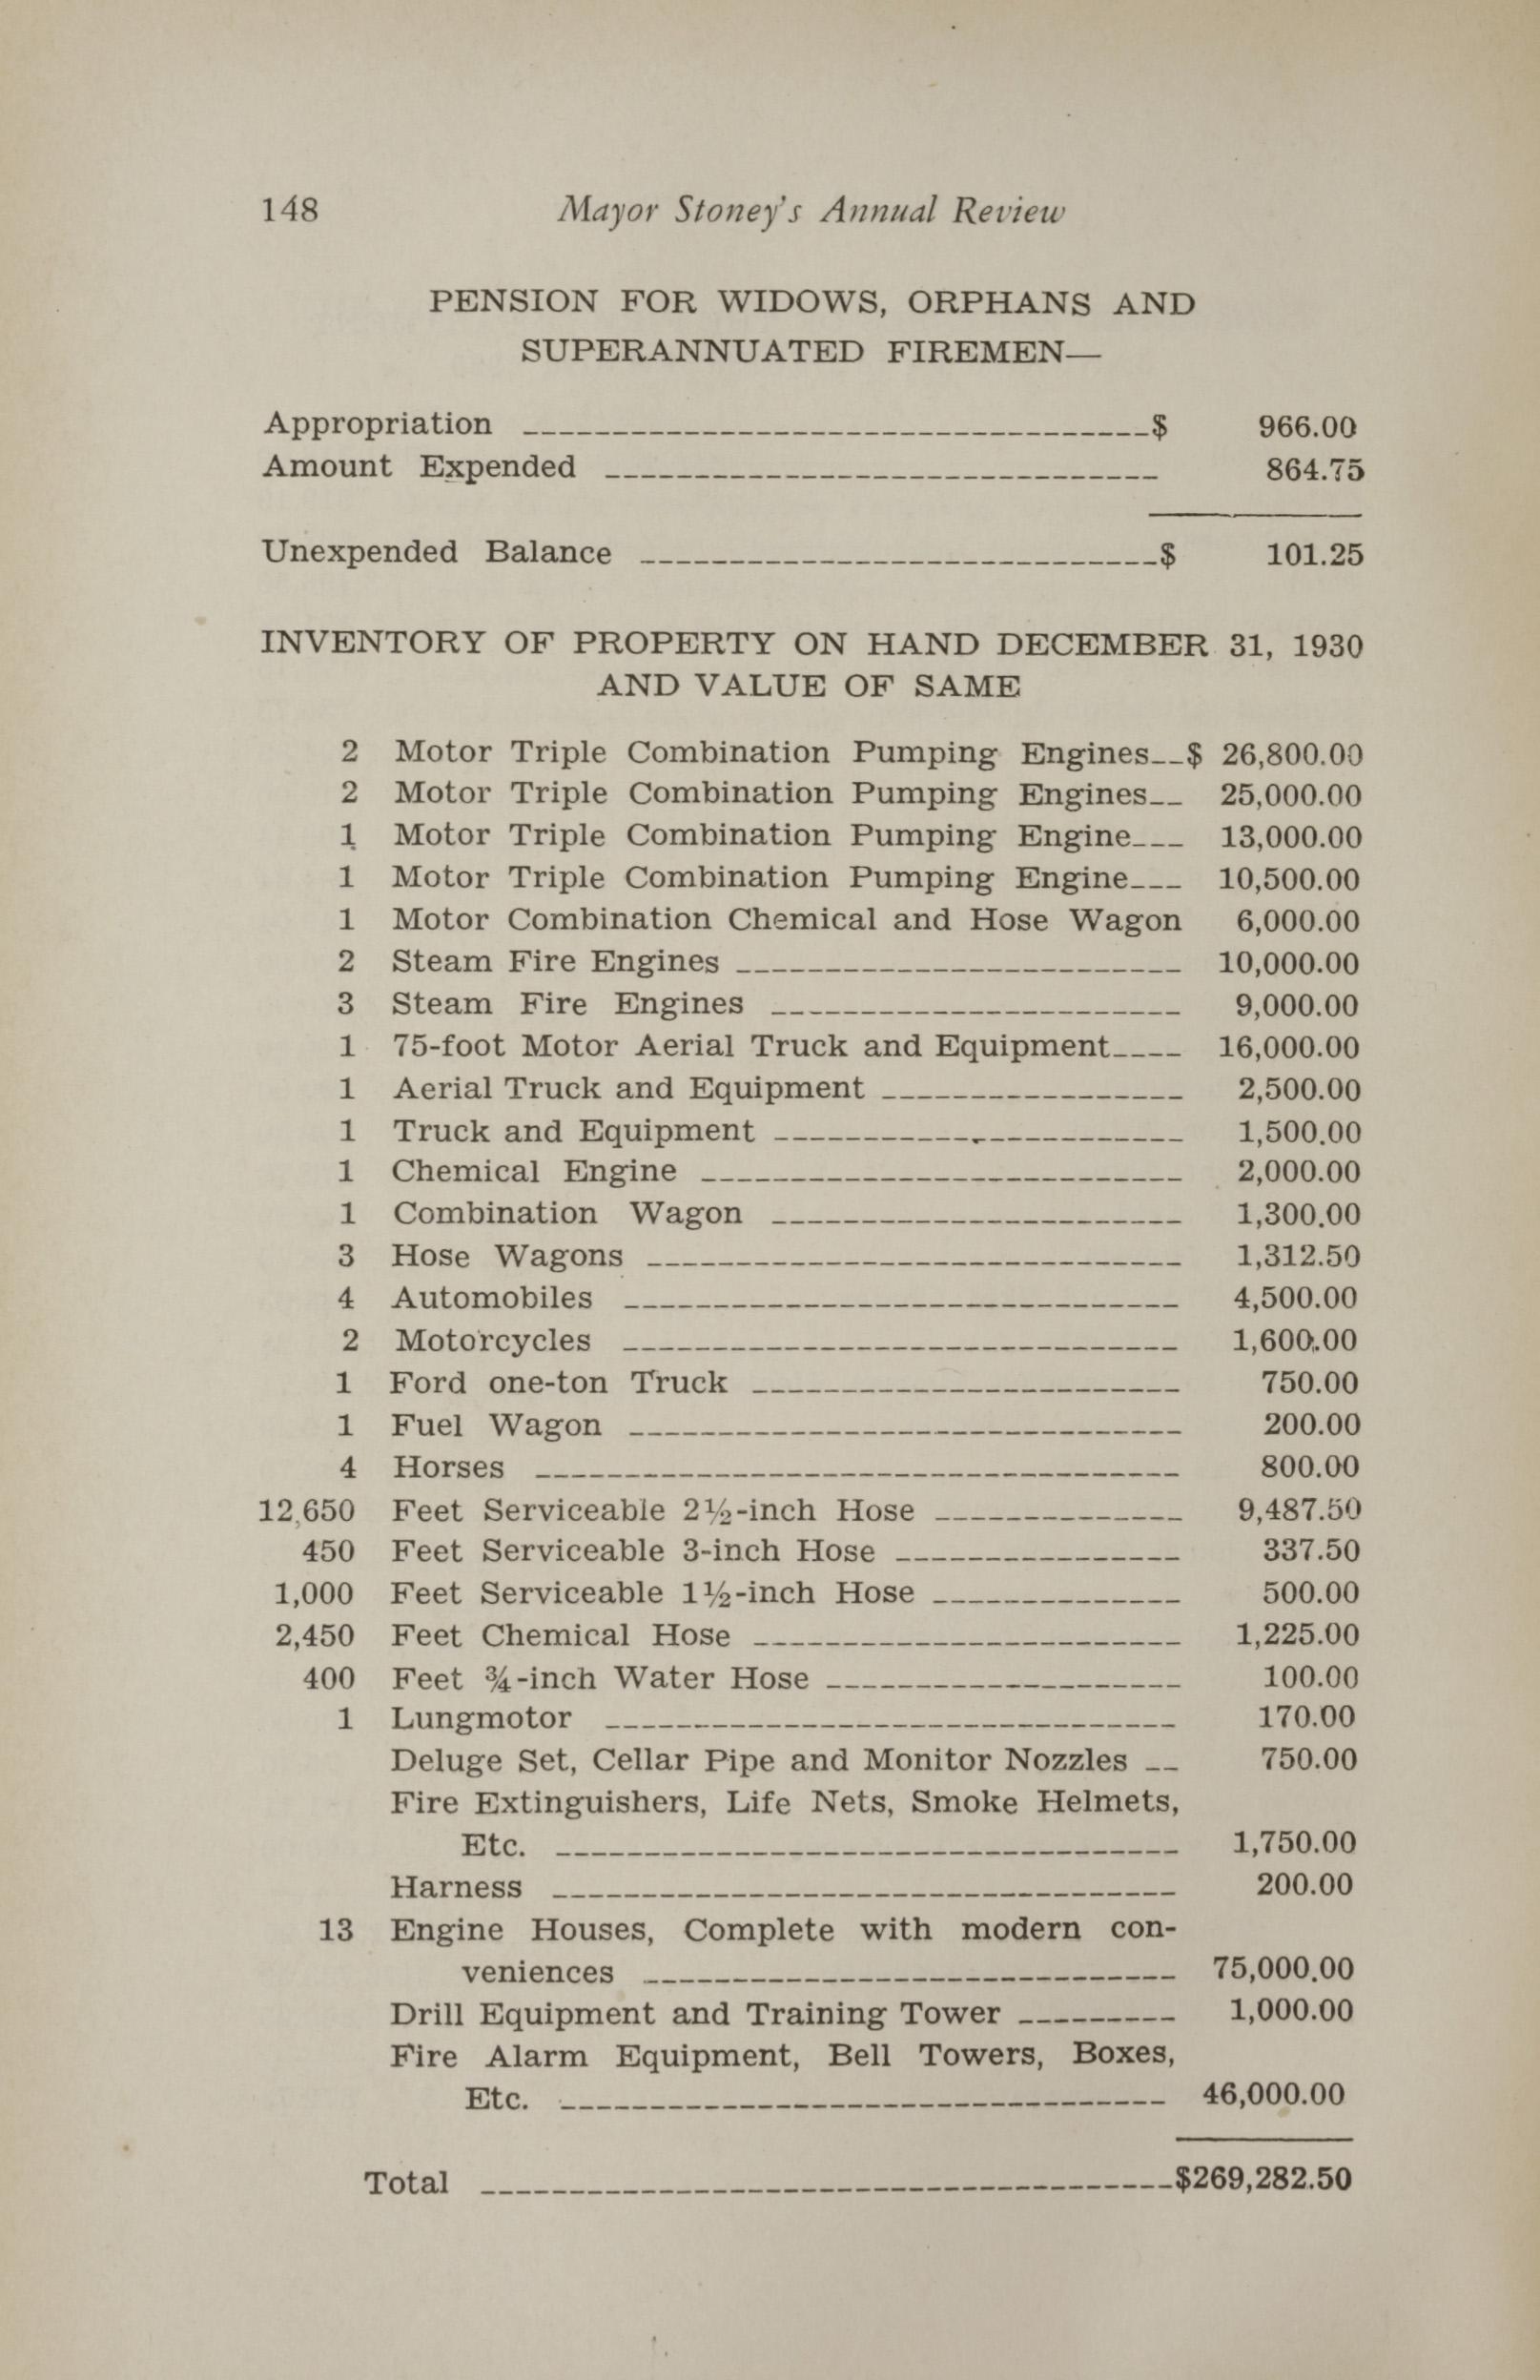 Charleston Yearbook, 1930, page 148